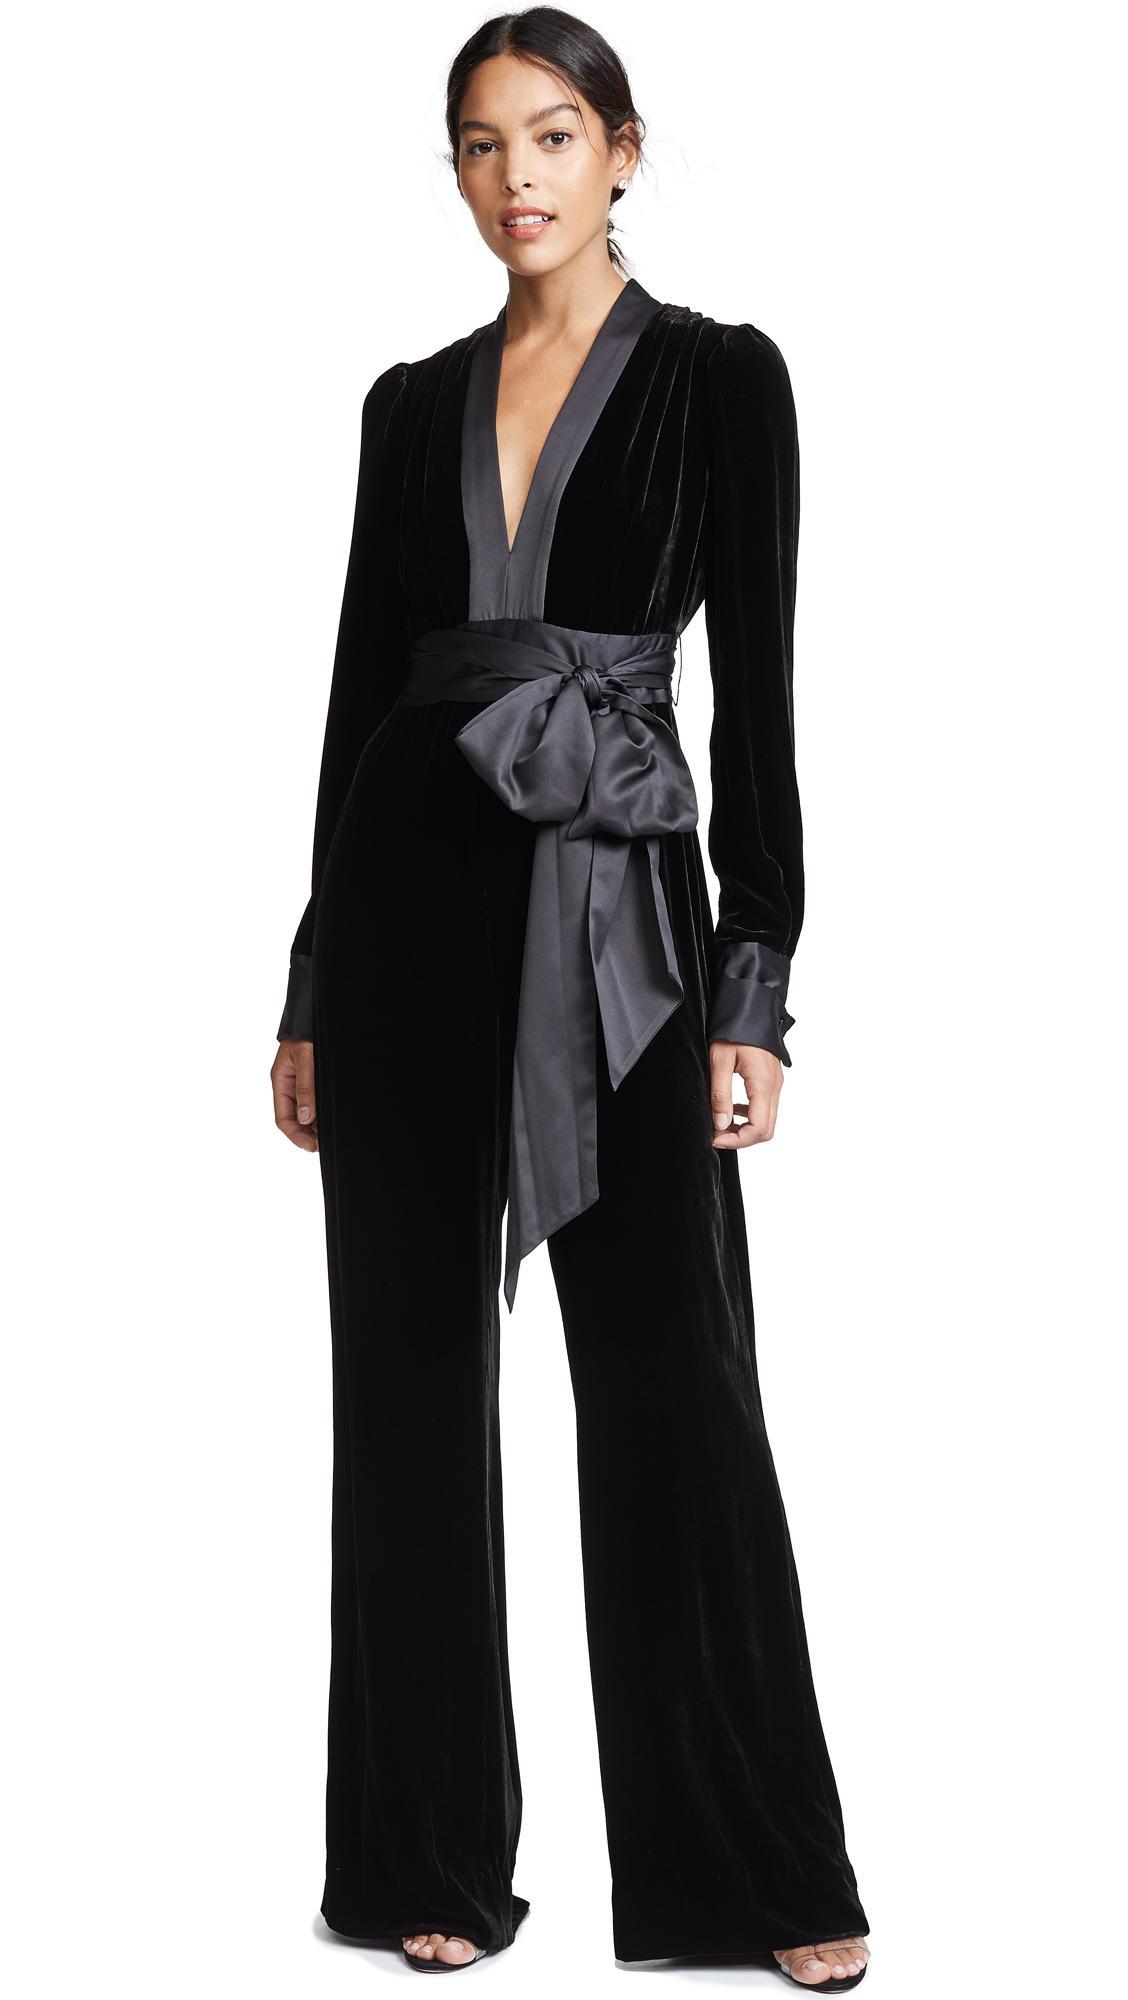 f8b2d3edacc Diane Von Furstenberg Velvet Long-Sleeve V-Neck Jumpsuit W  Sash In Black